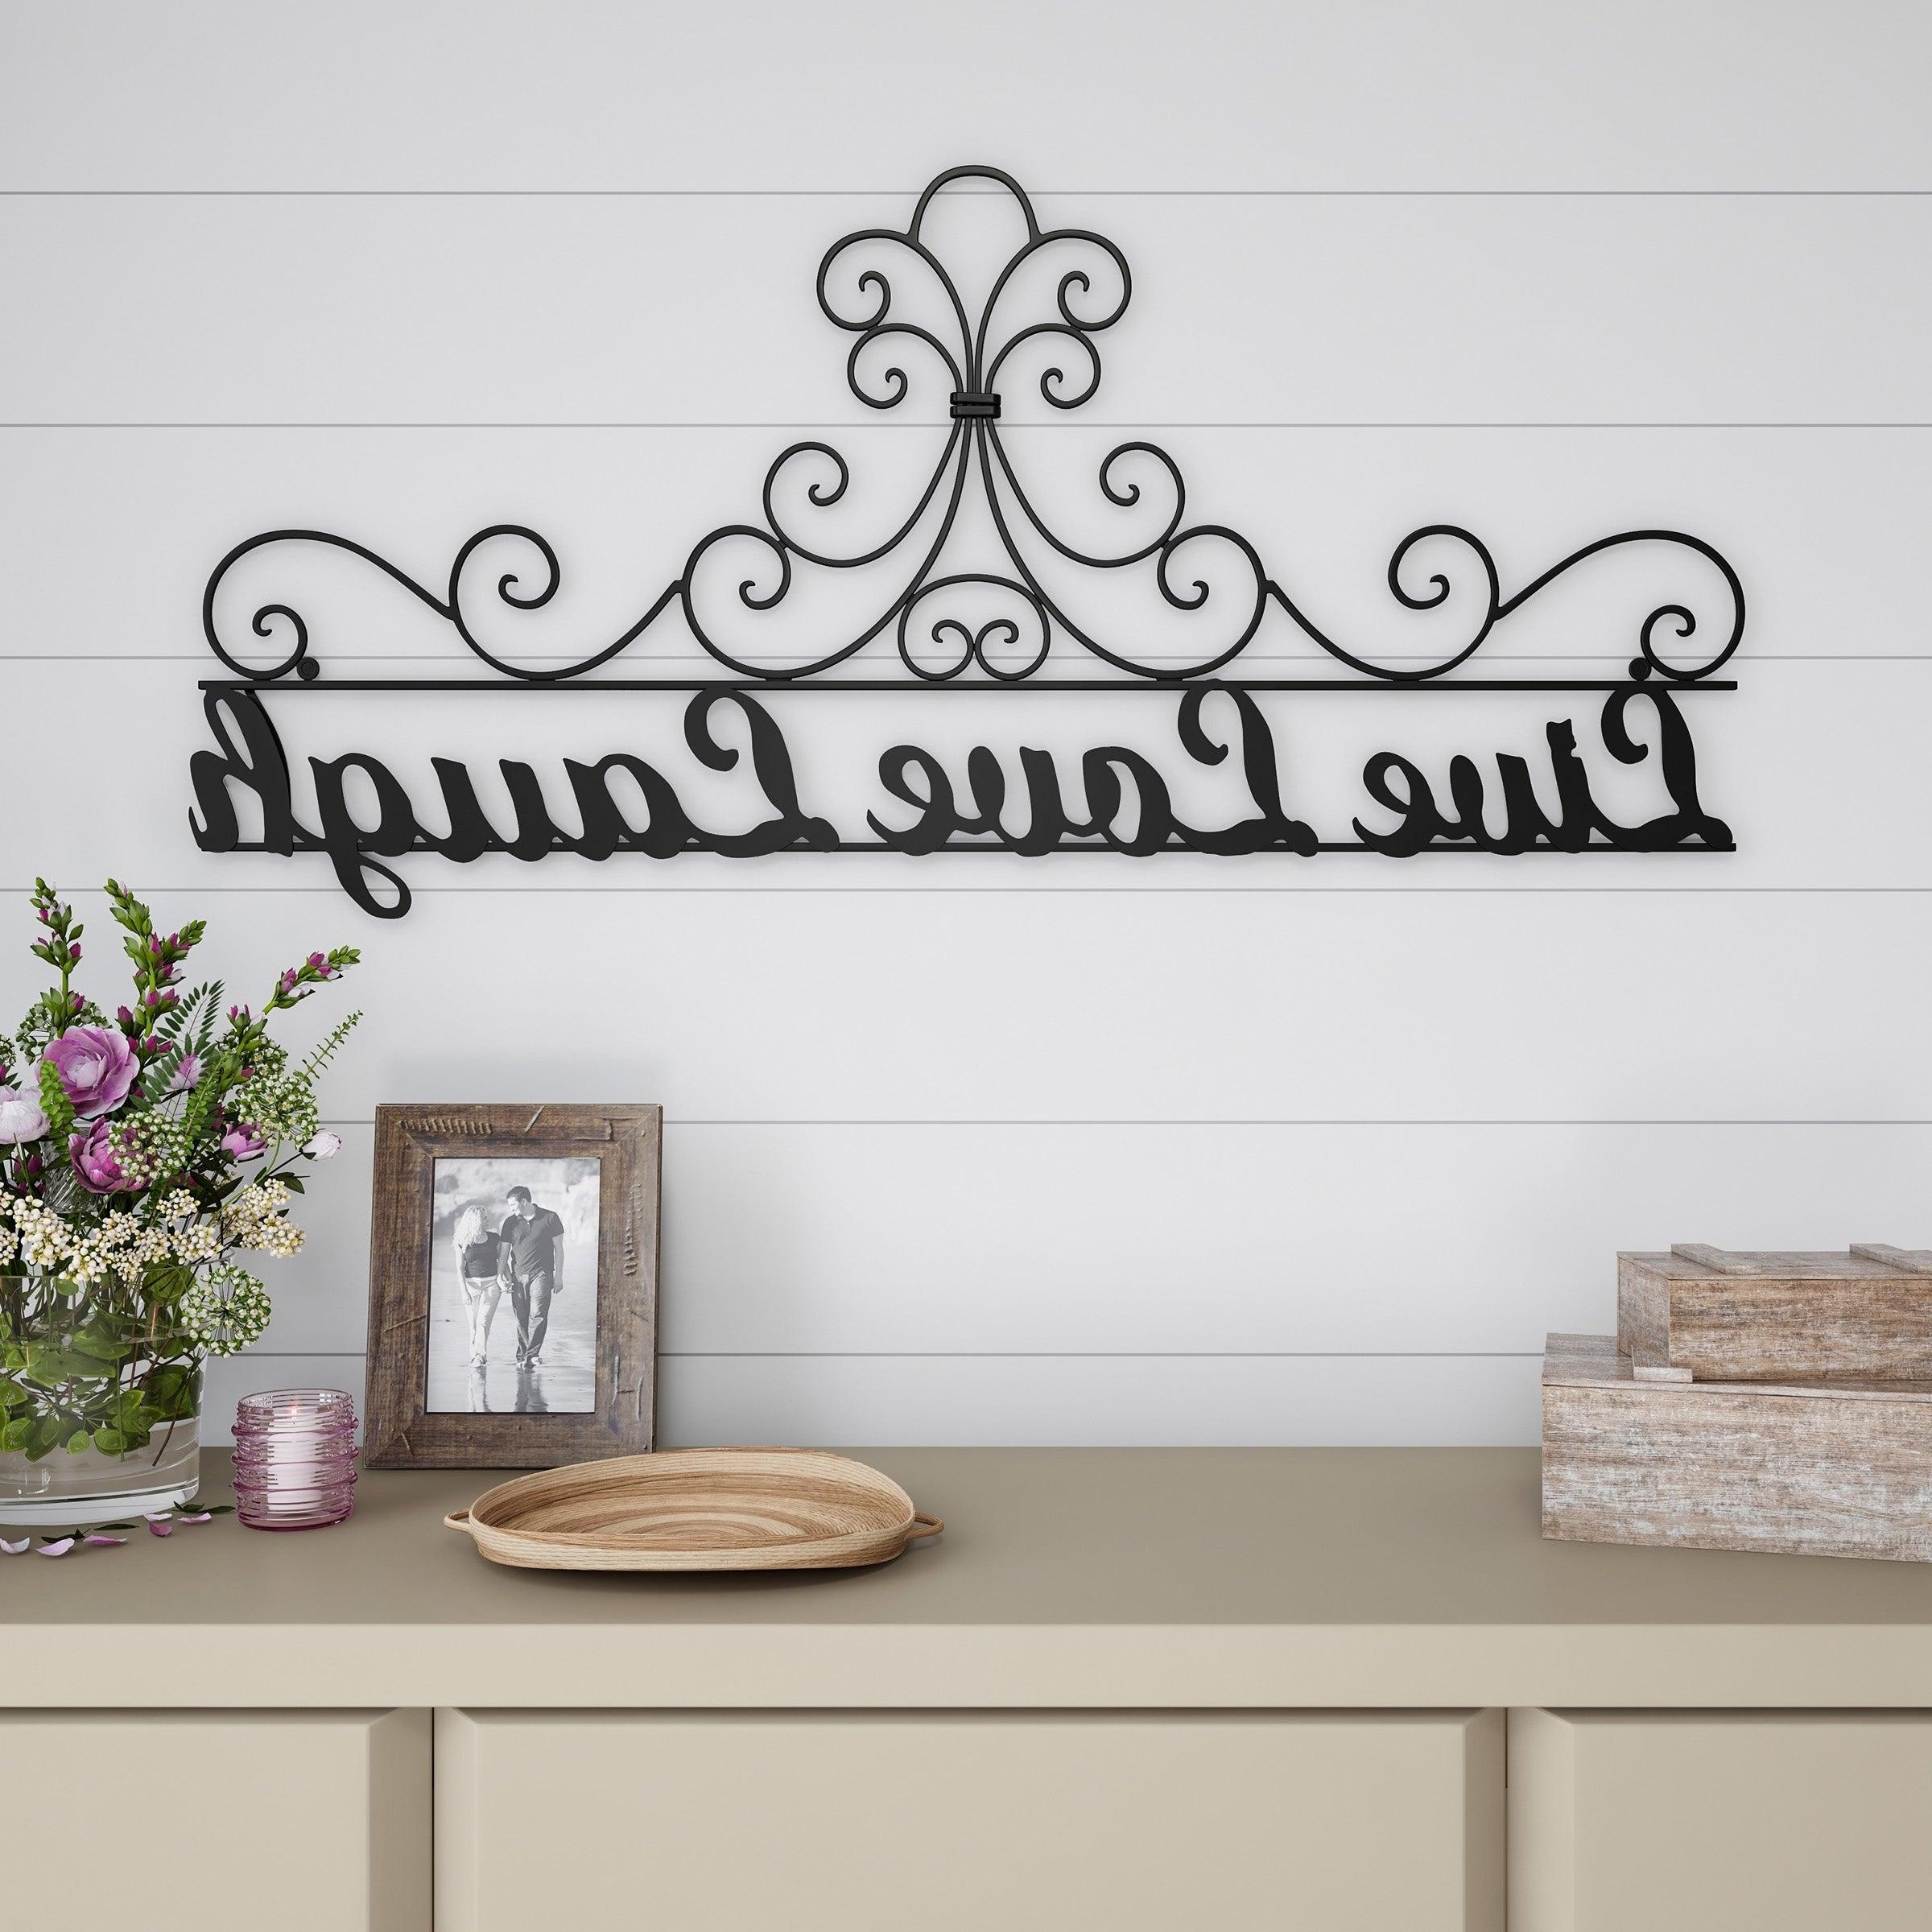 Trendy Live, Laugh, Love Antique Copper Wall Decor For Shop Metal Cutout Live Laugh Love Decorative Wall Sign 3D Word Art (View 16 of 20)